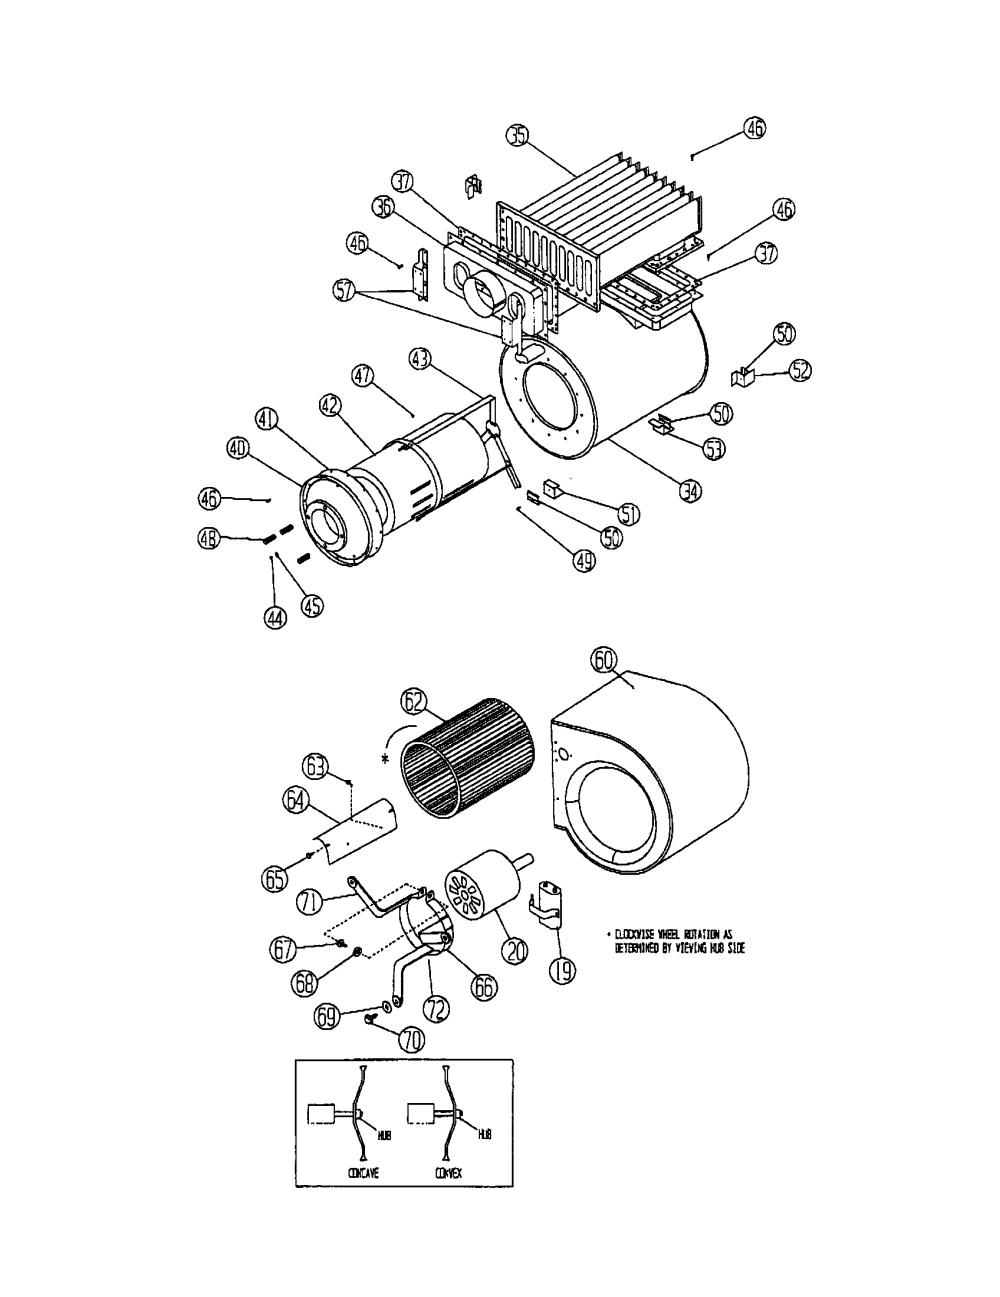 medium resolution of ducane furnace parts images